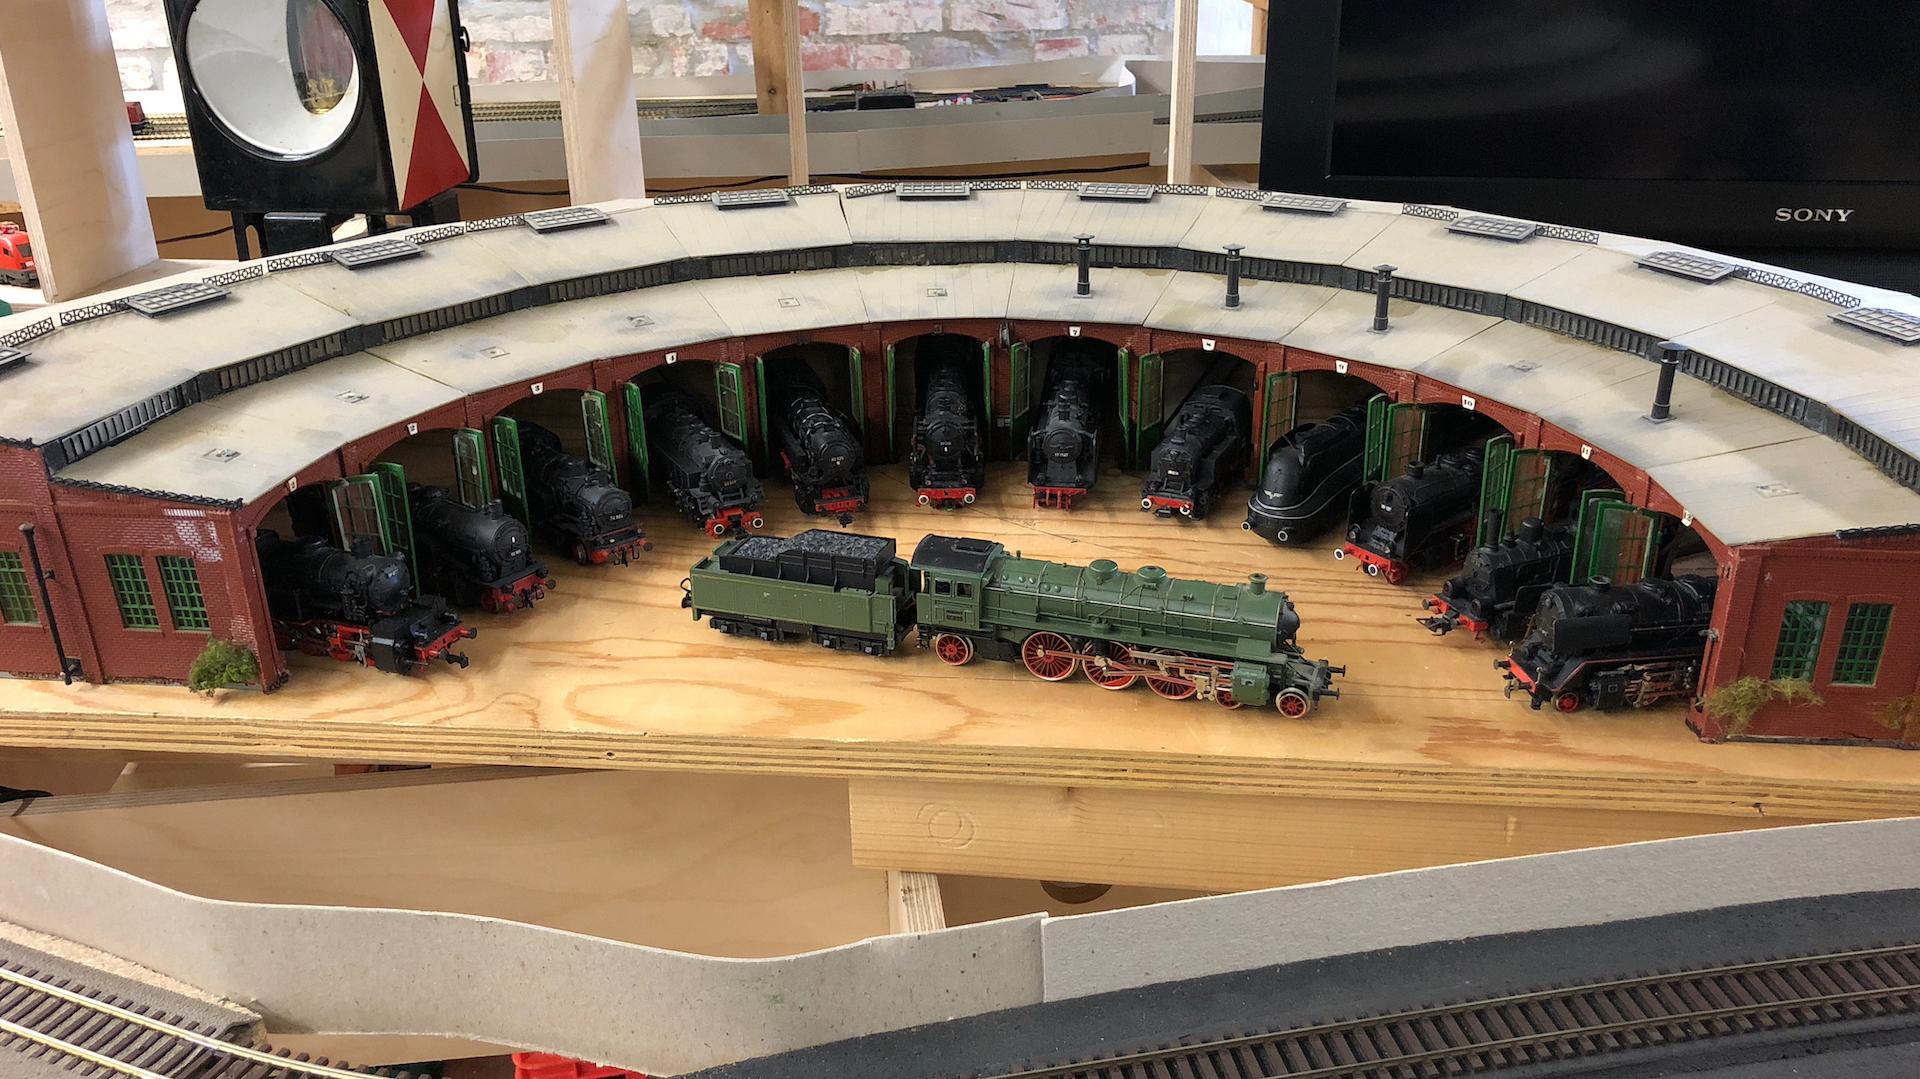 18_02_24_Schautag-Eisenbahnfreunde-Hameln_009